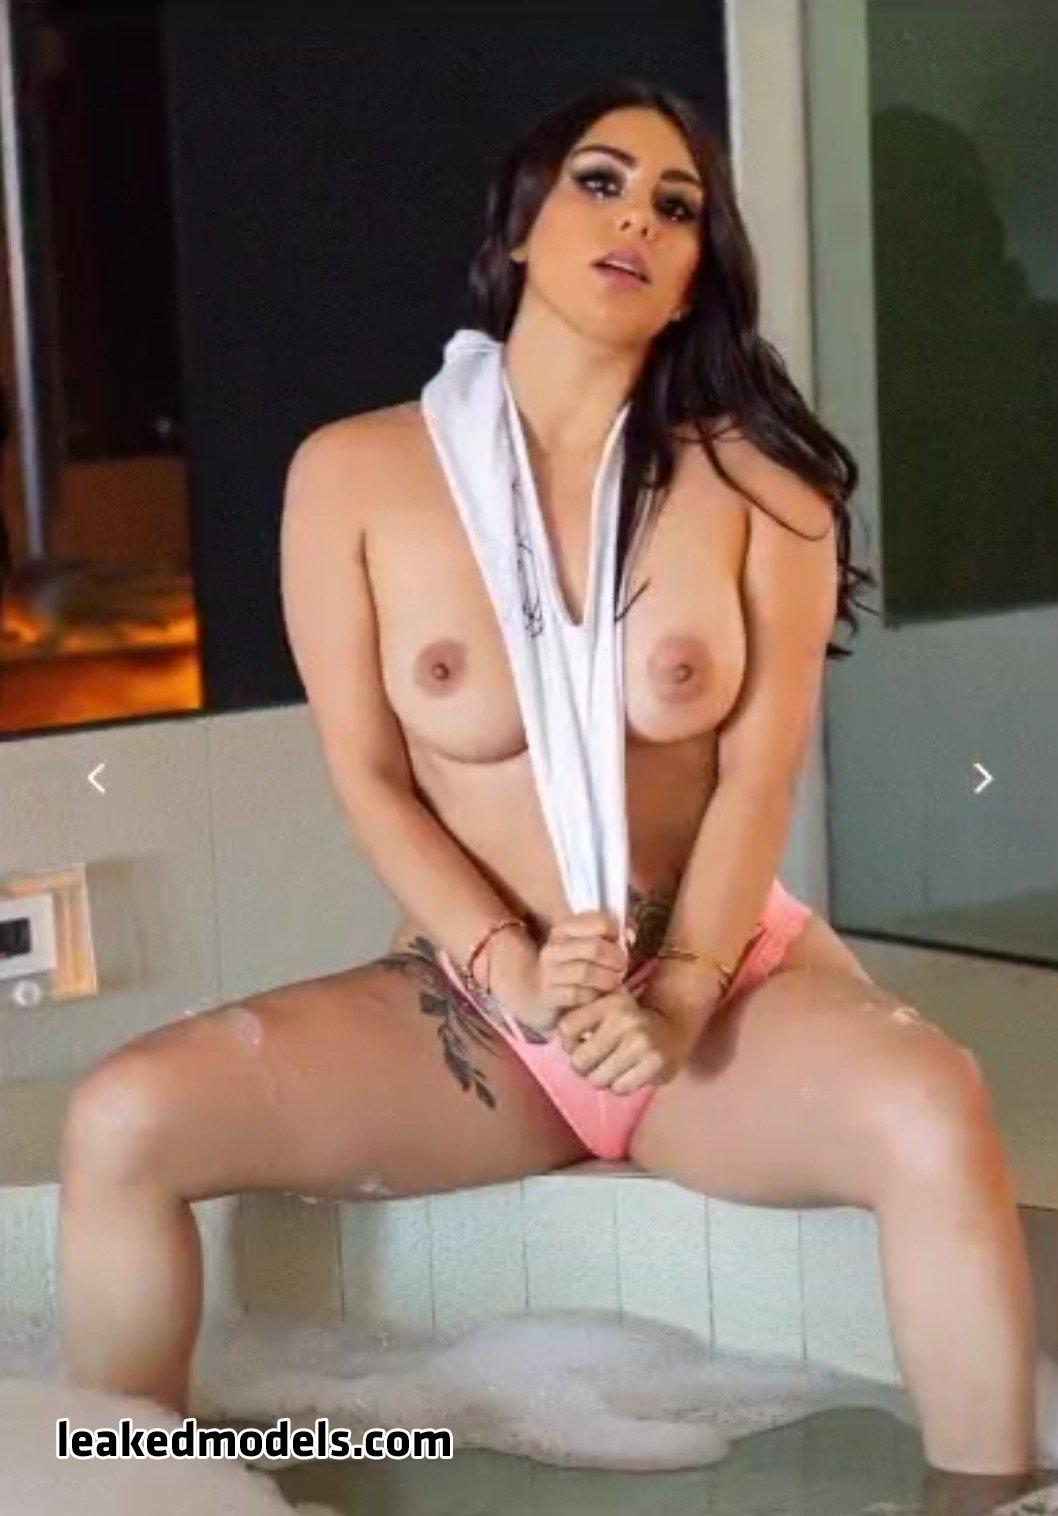 nydimoreno leaked nude leakedmodels.com 0006 - Nydia Moreno – nydimoreno OnlyFans Nude Leaks (25 Photos)